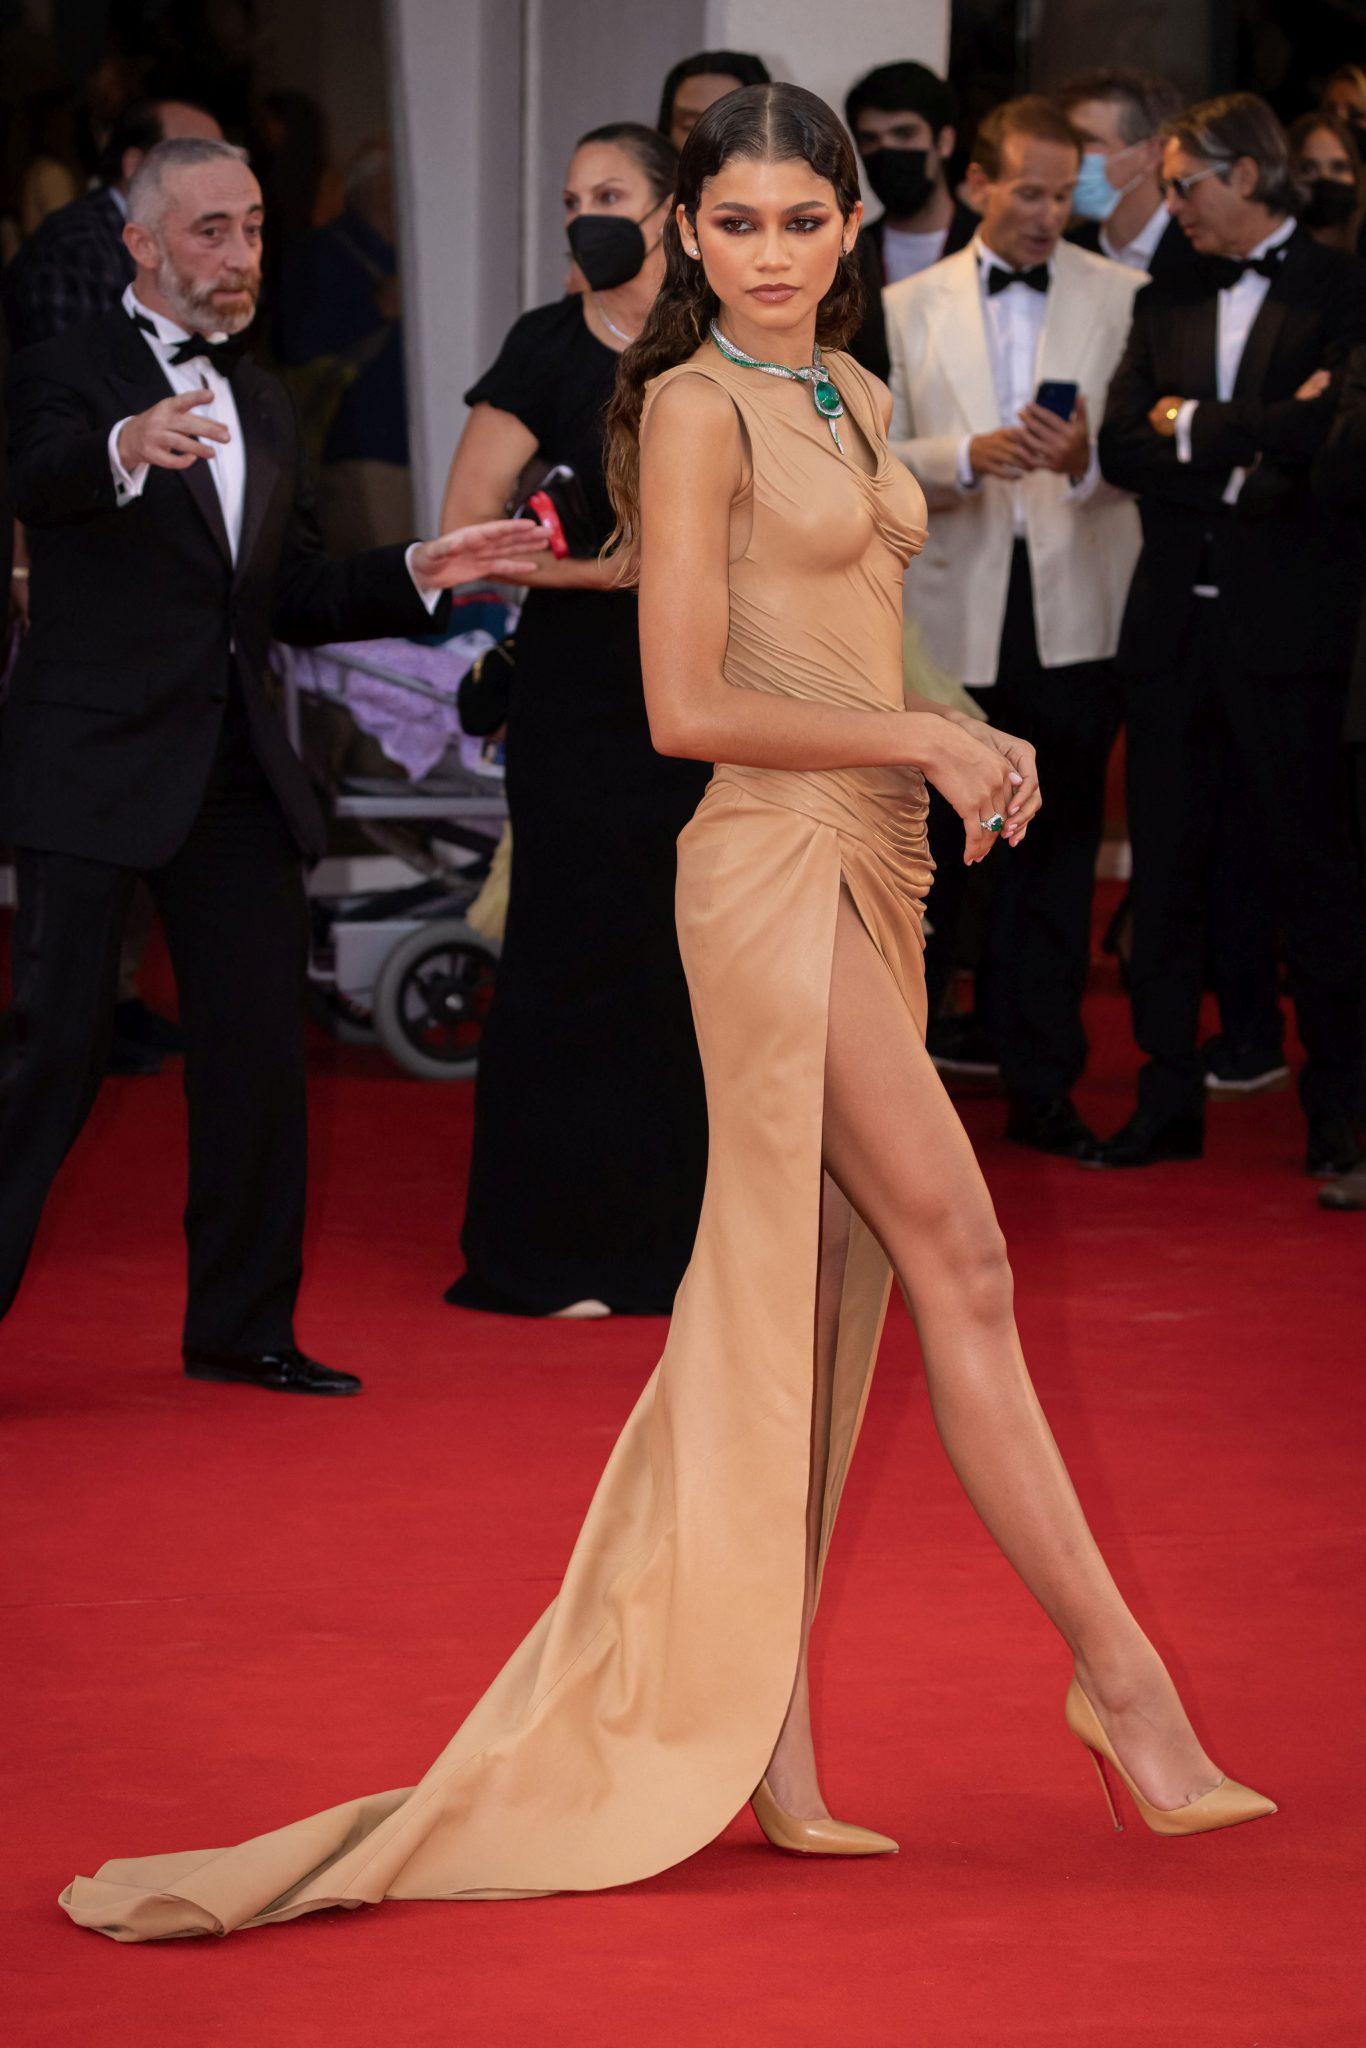 Style icon: Zendaya, noua zeiță a Hollywoodului